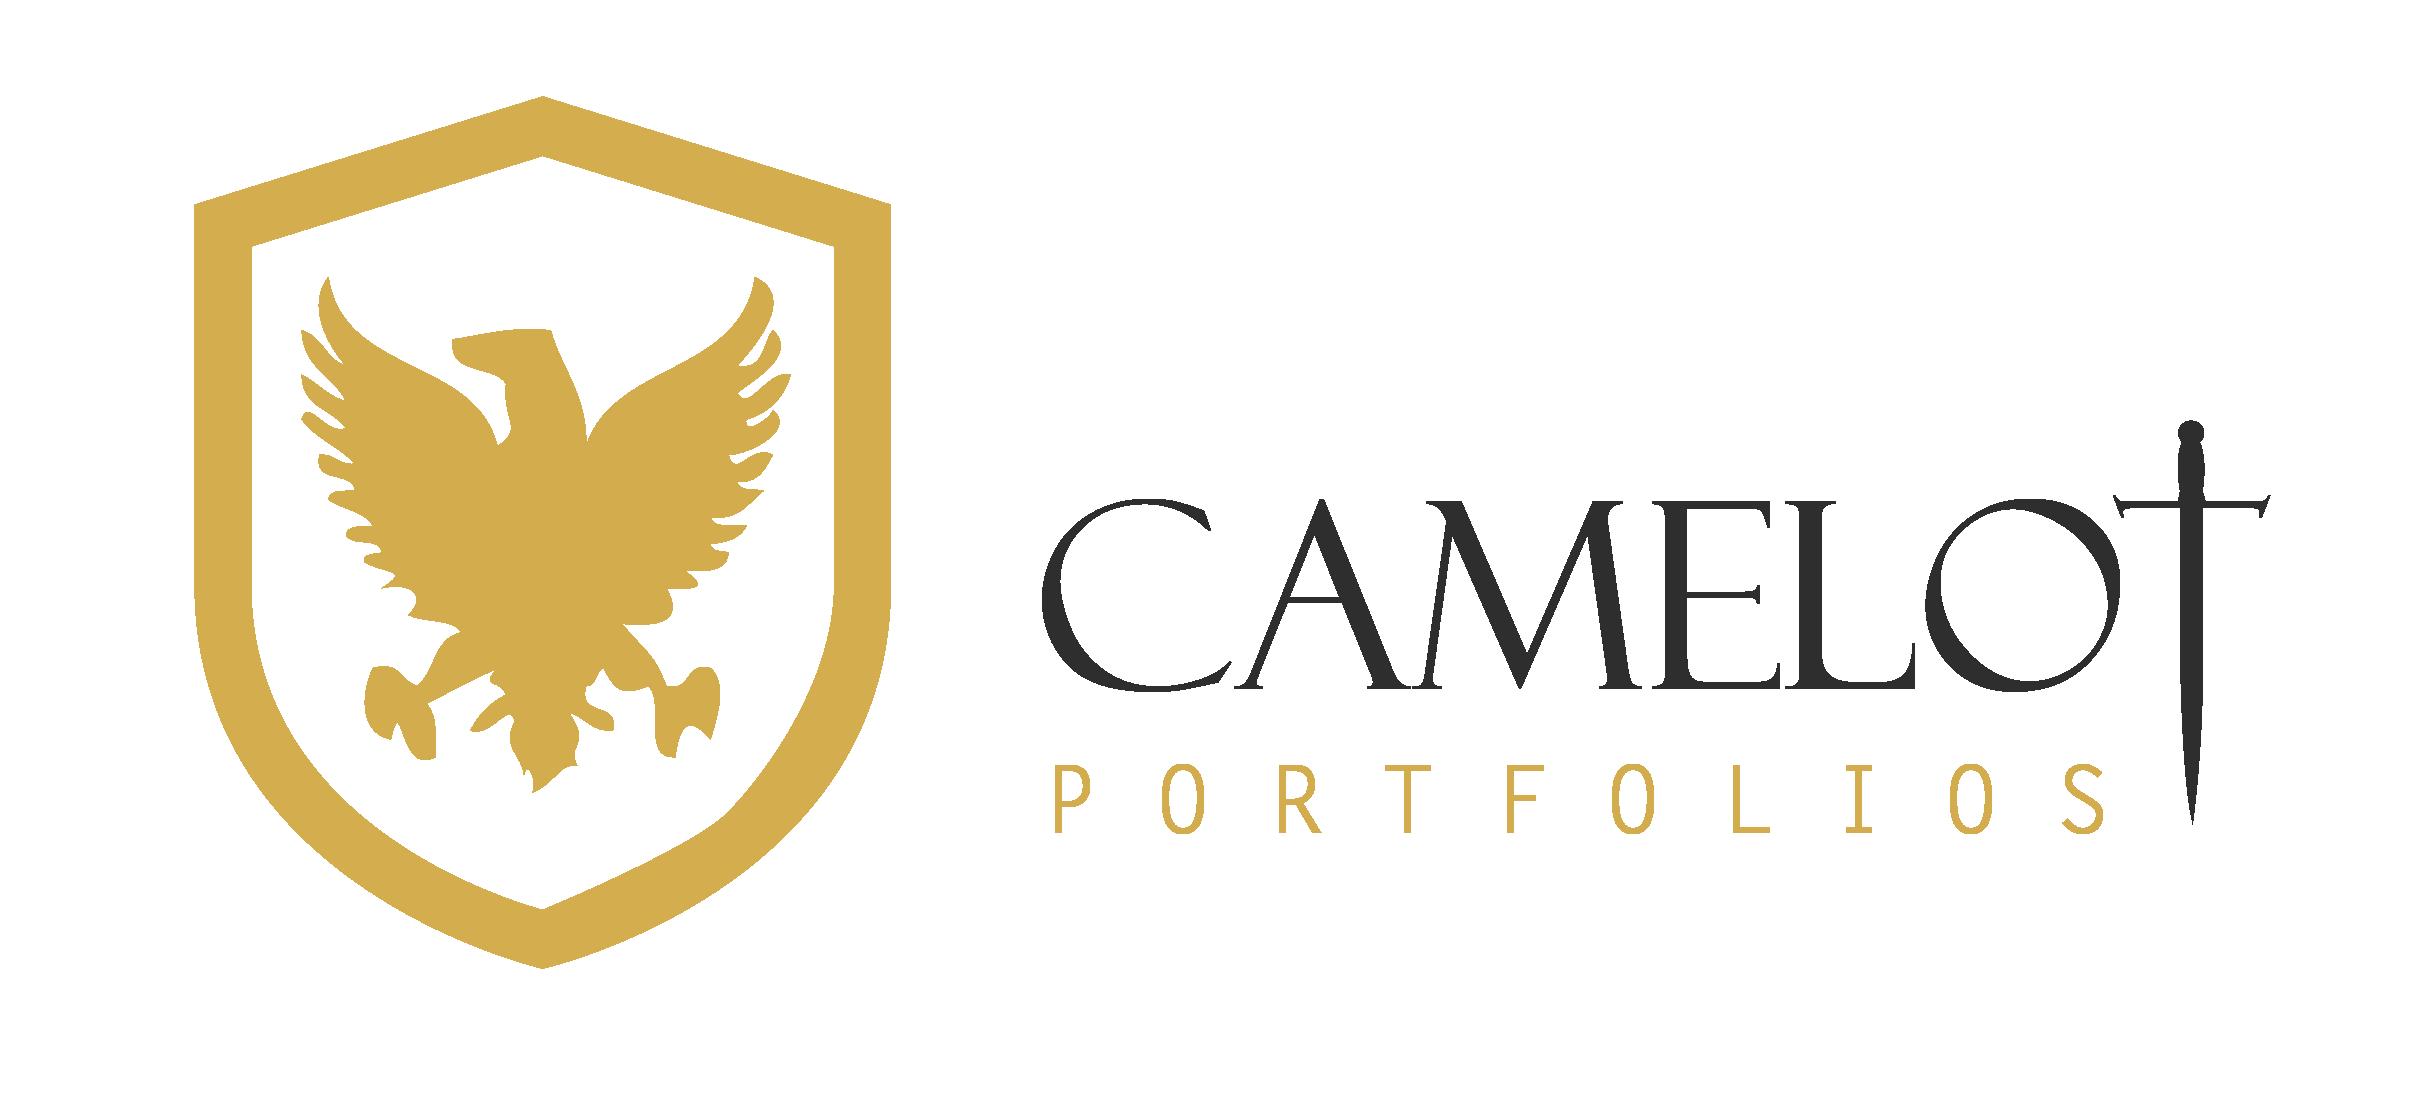 portfolios.landscape-01.png